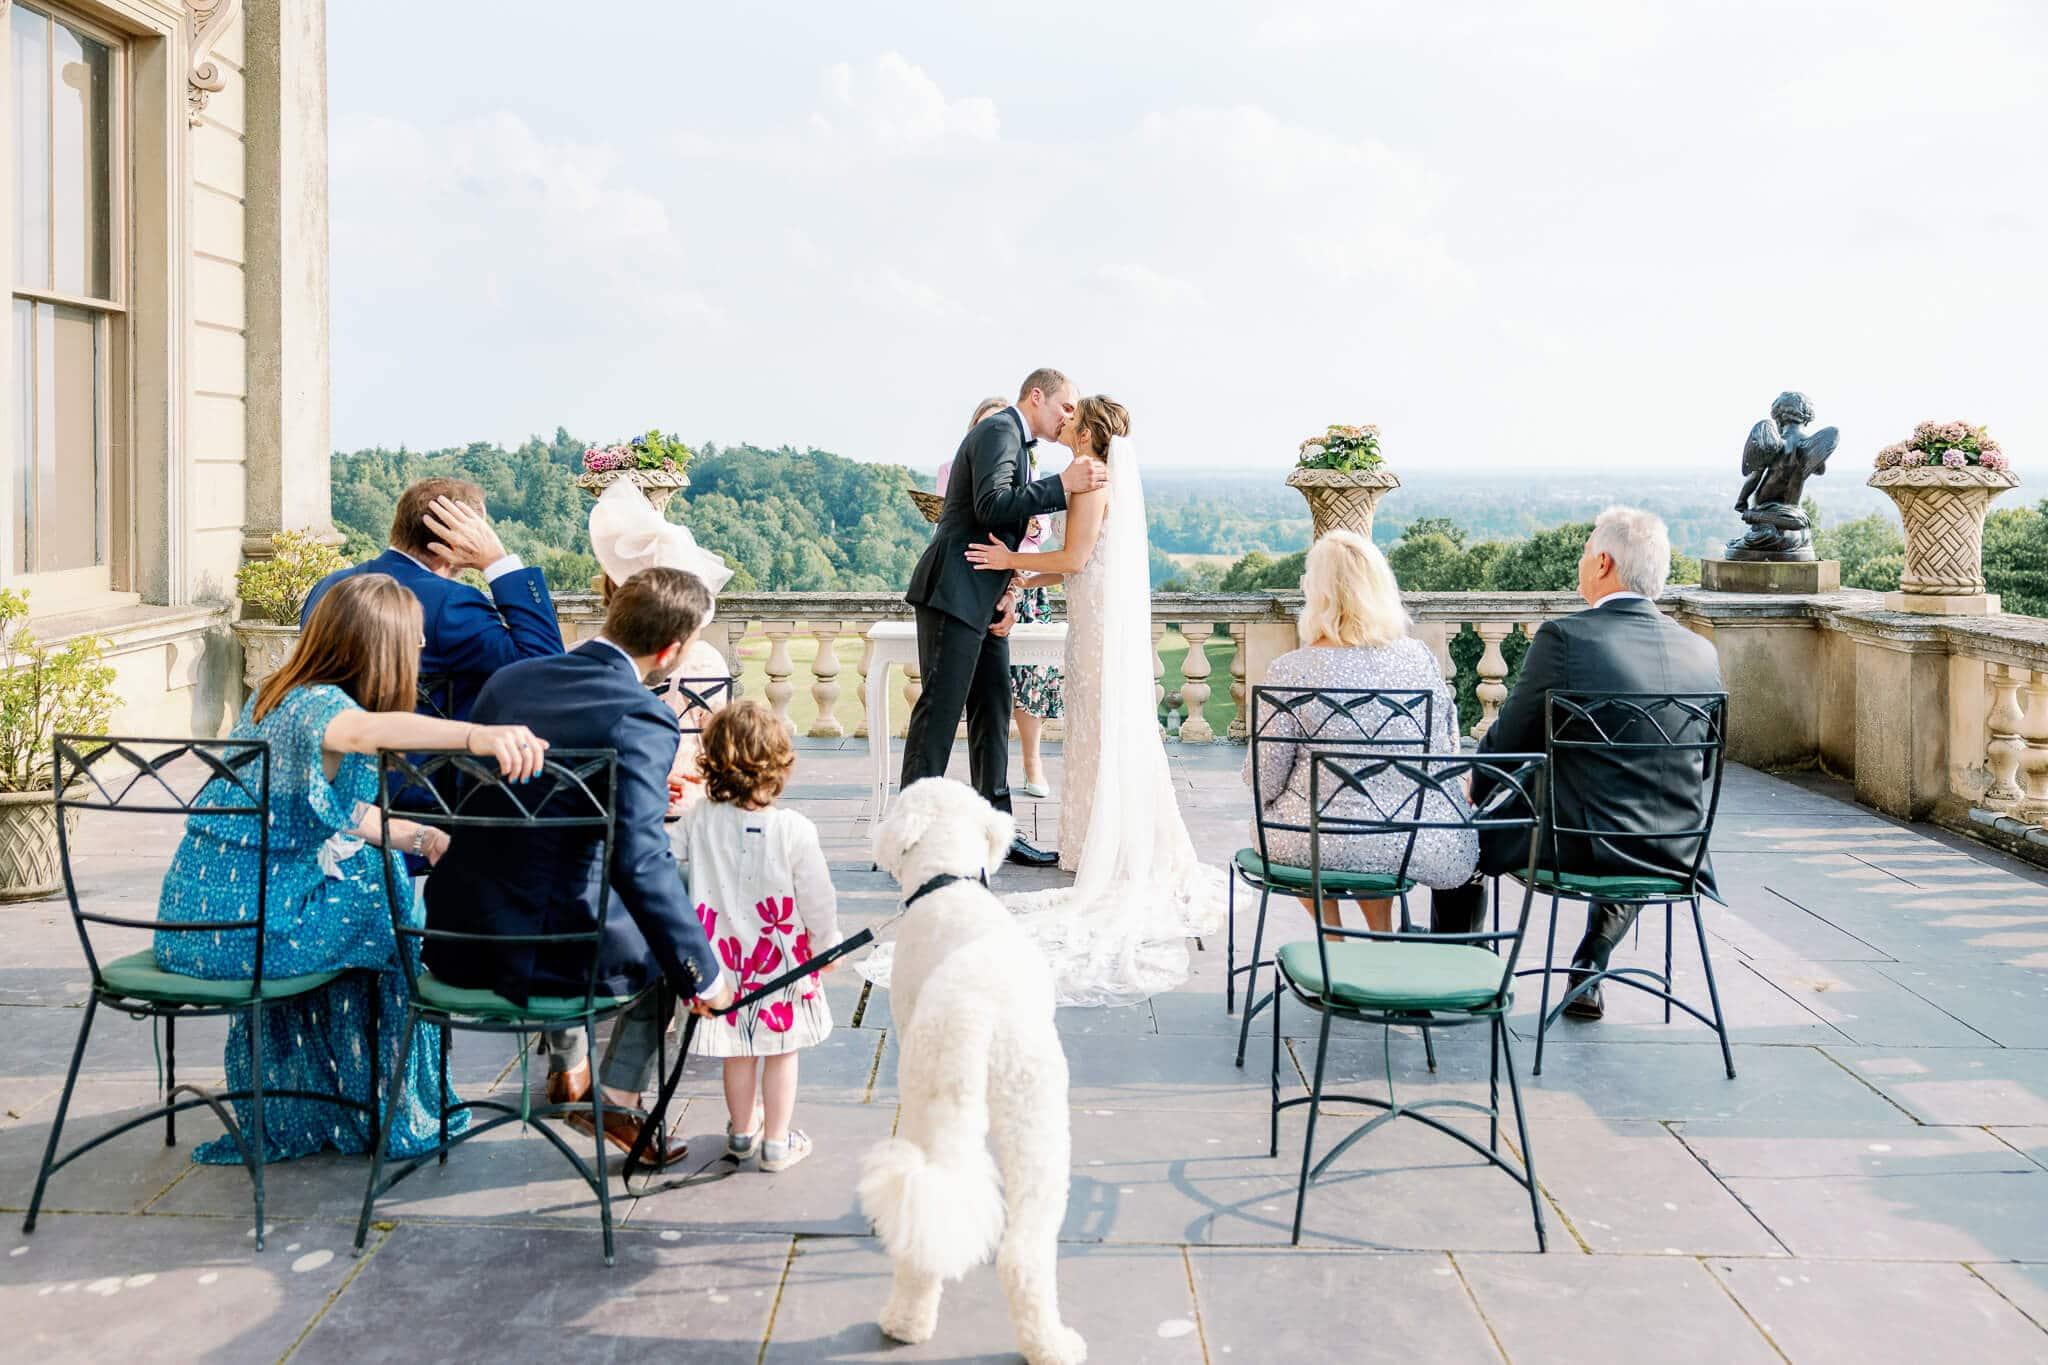 Cliveden House weddings dog friendly ceremony on terrace | Cliveden House Wedding Photographer